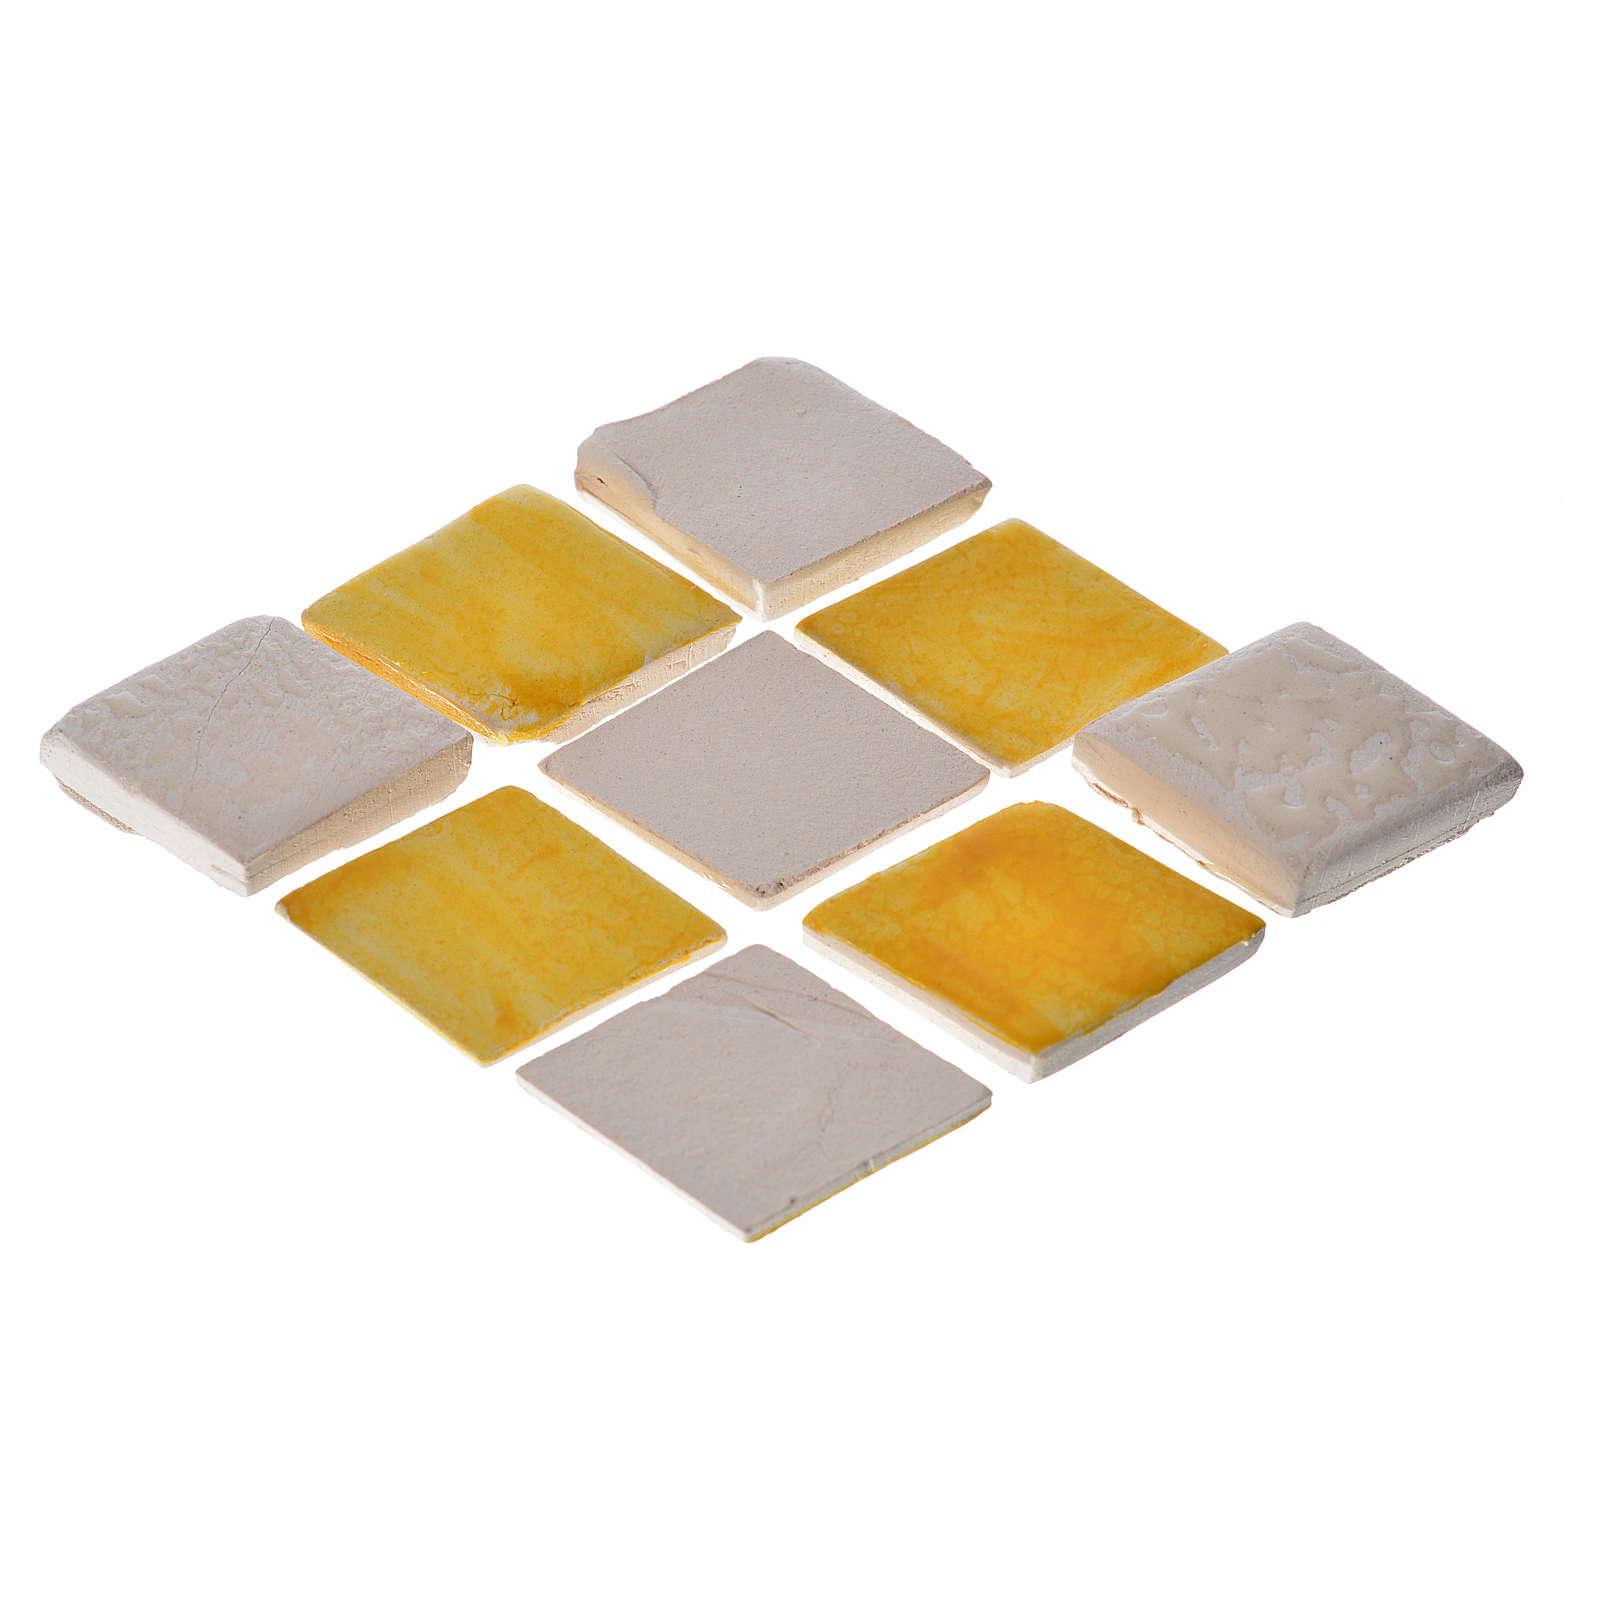 Nativity accessory, terracotta tiles with enamel, diamond 60pcs, 4